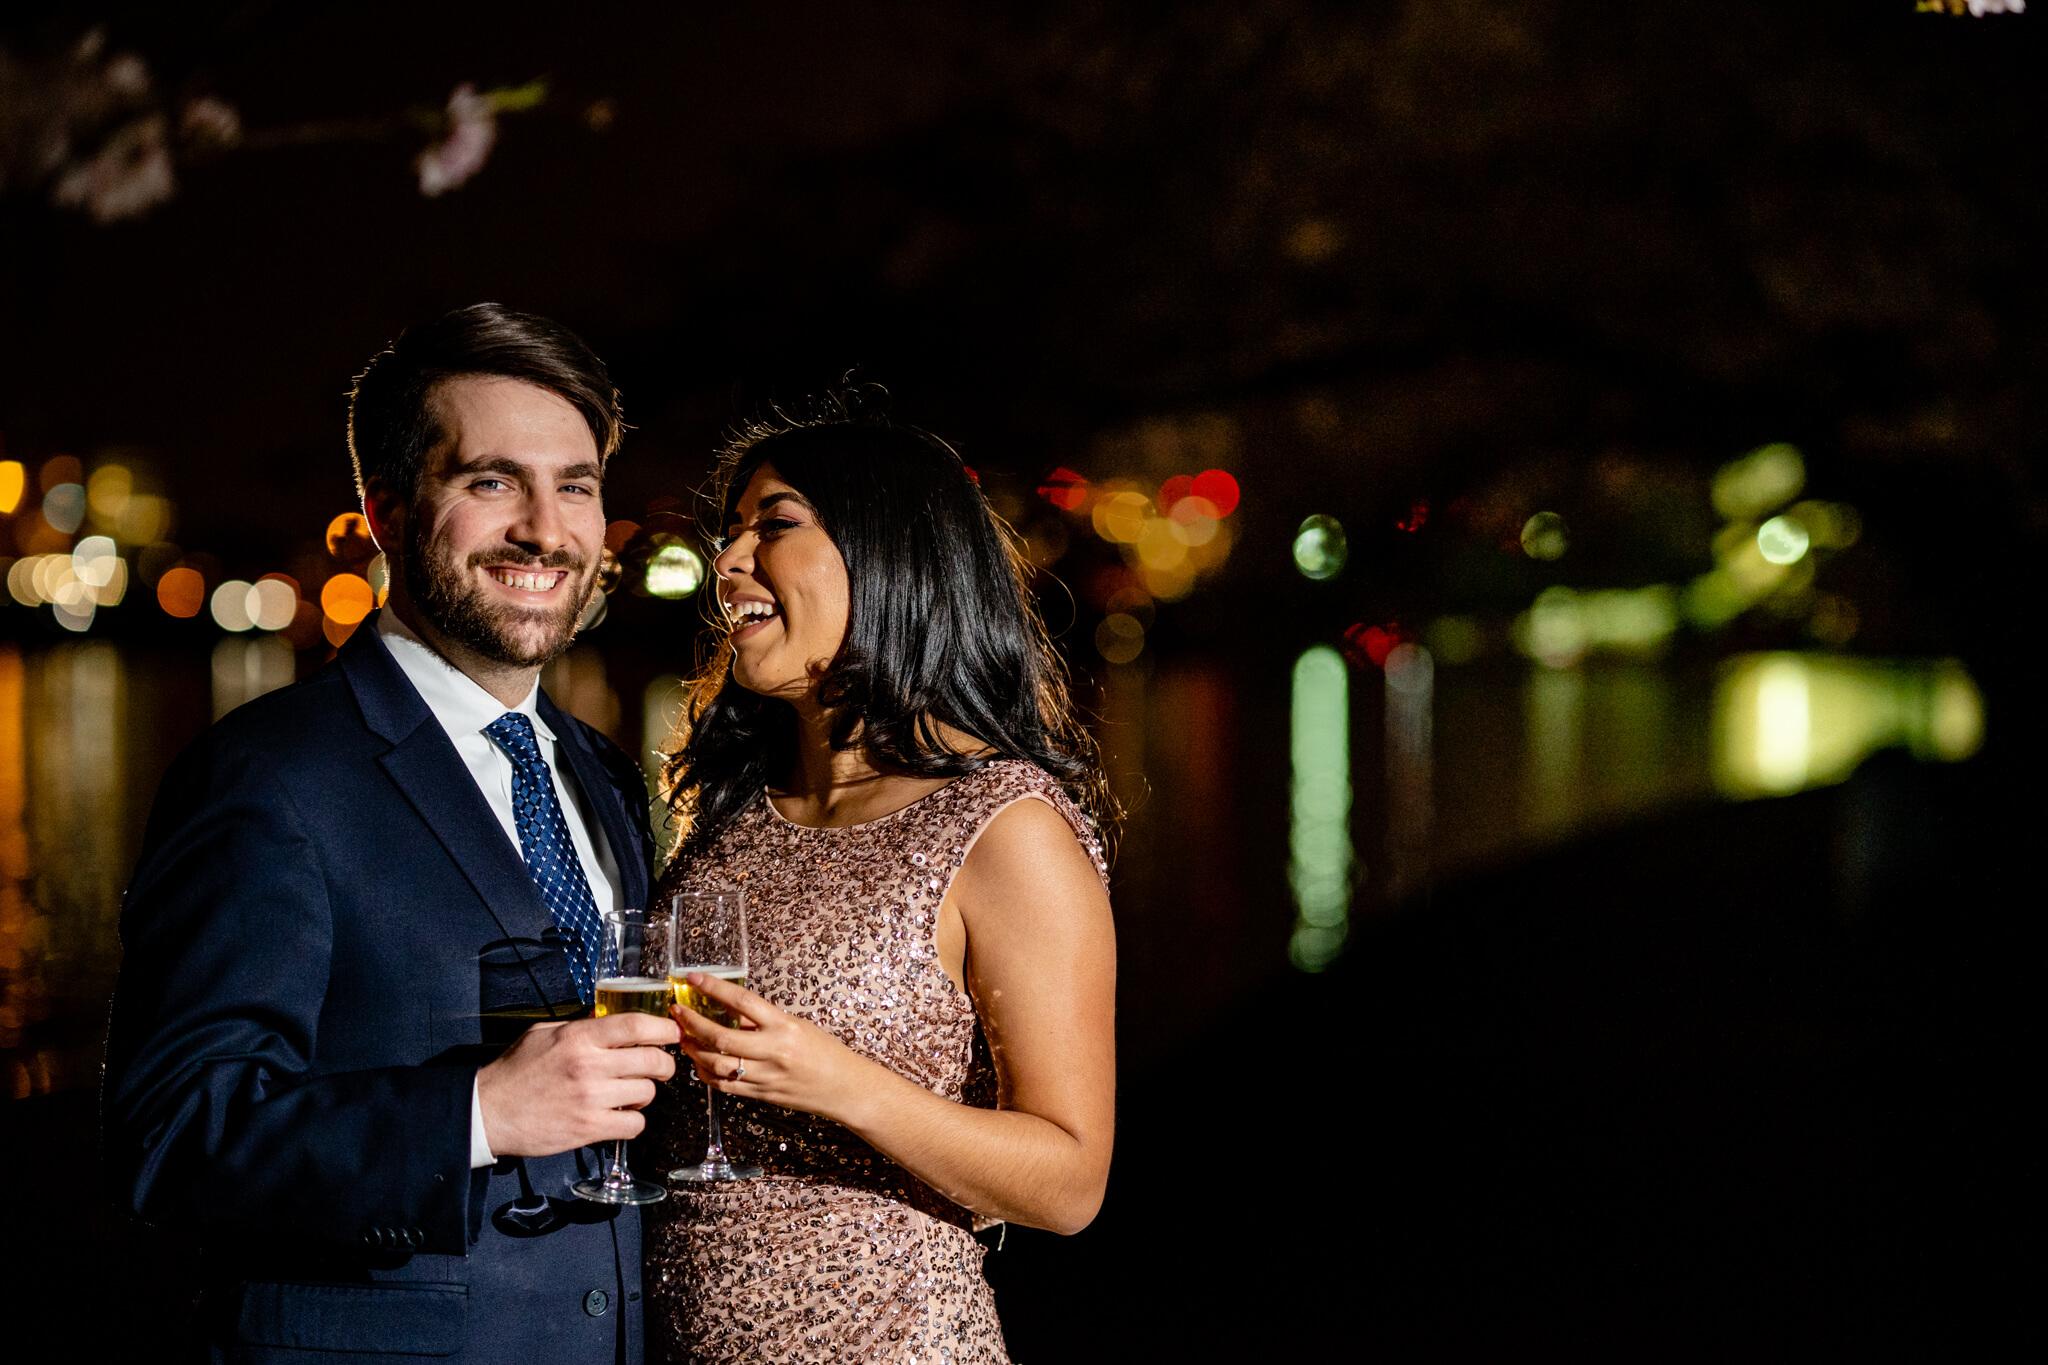 Danielle Michael DC Cherry Blossom Engagement Tidal Basin Washington Monument Engaged NYE Wedding Inspiration-8.jpg